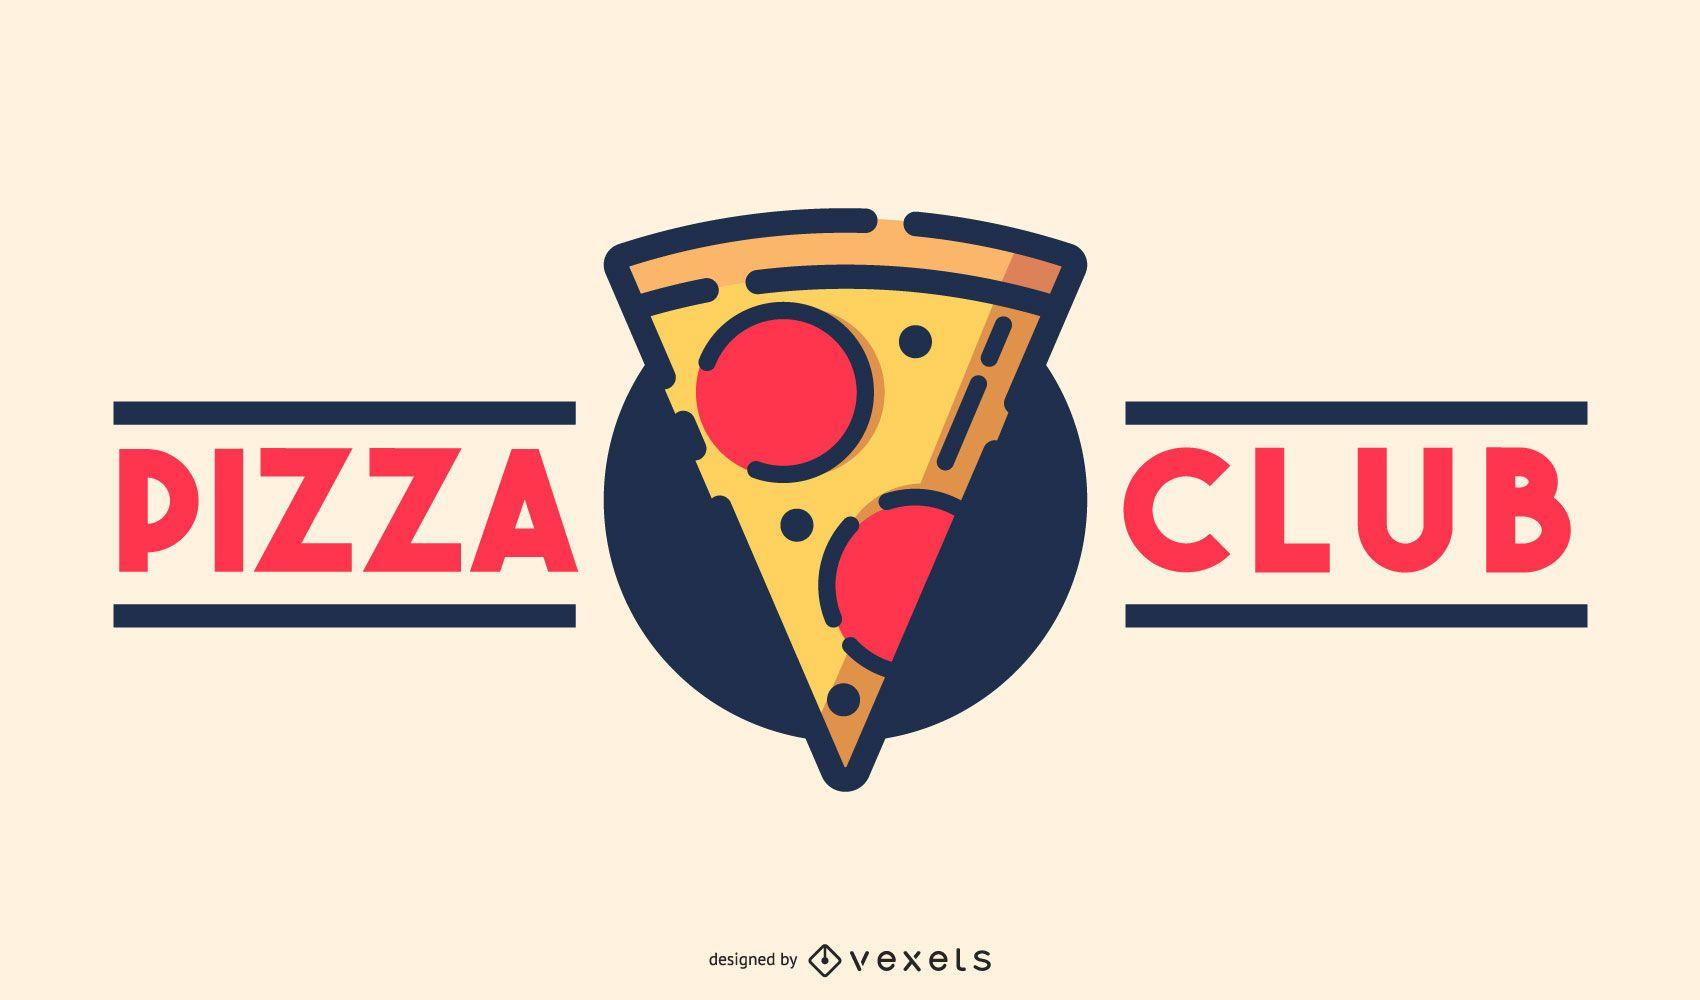 Pizza club logo design